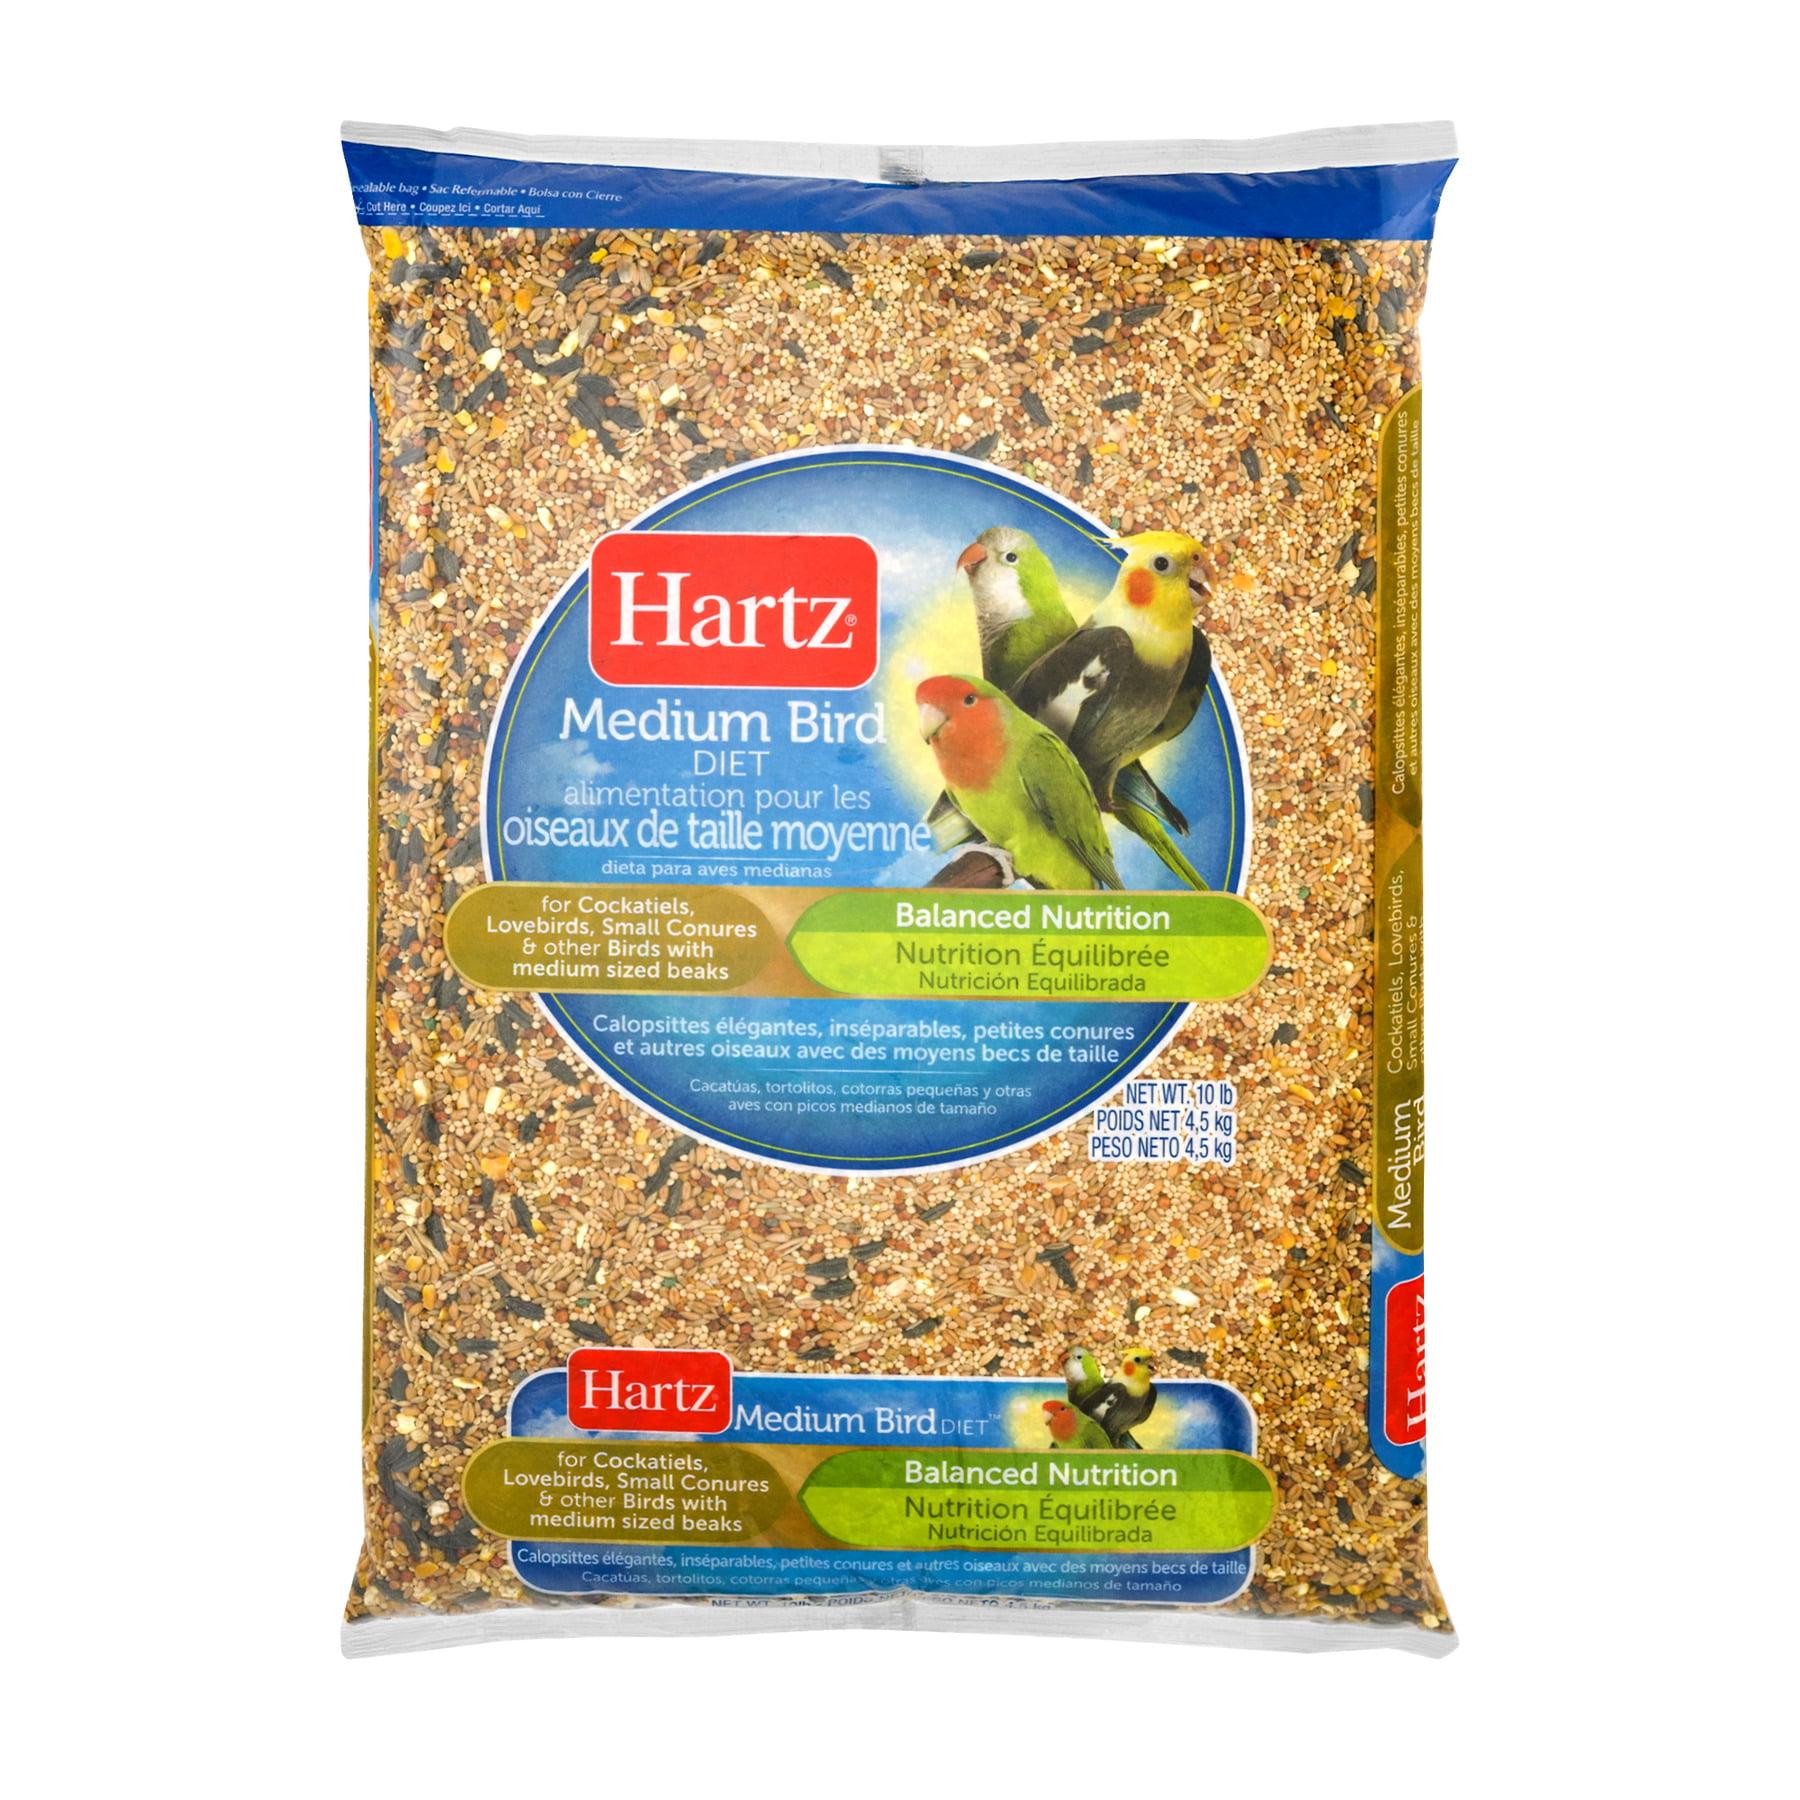 Hartz Medium Bird Food, 10.0 LB by The Hartz Mountain Corporation